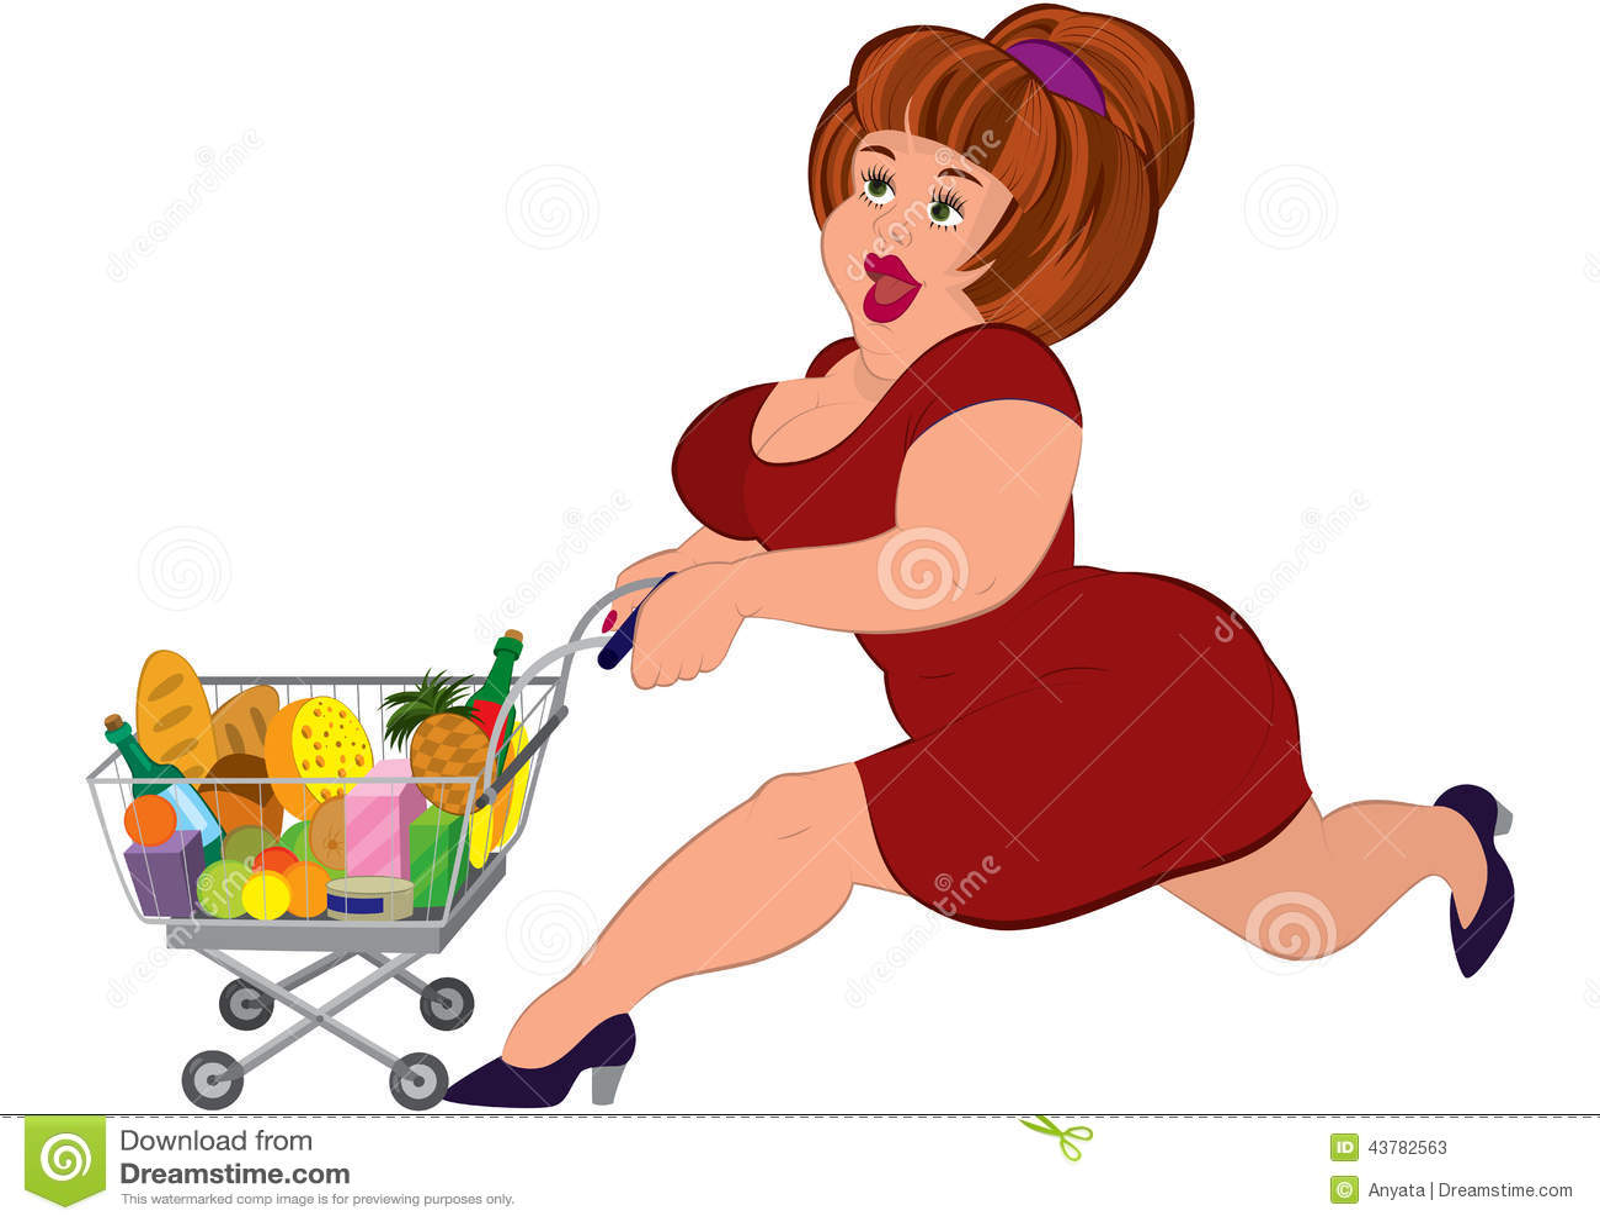 cartoon fat woman stock illustrations 3 174 cartoon fat woman rh dreamstime com Fat Female Cartoon Characters Fat Man Cartoon